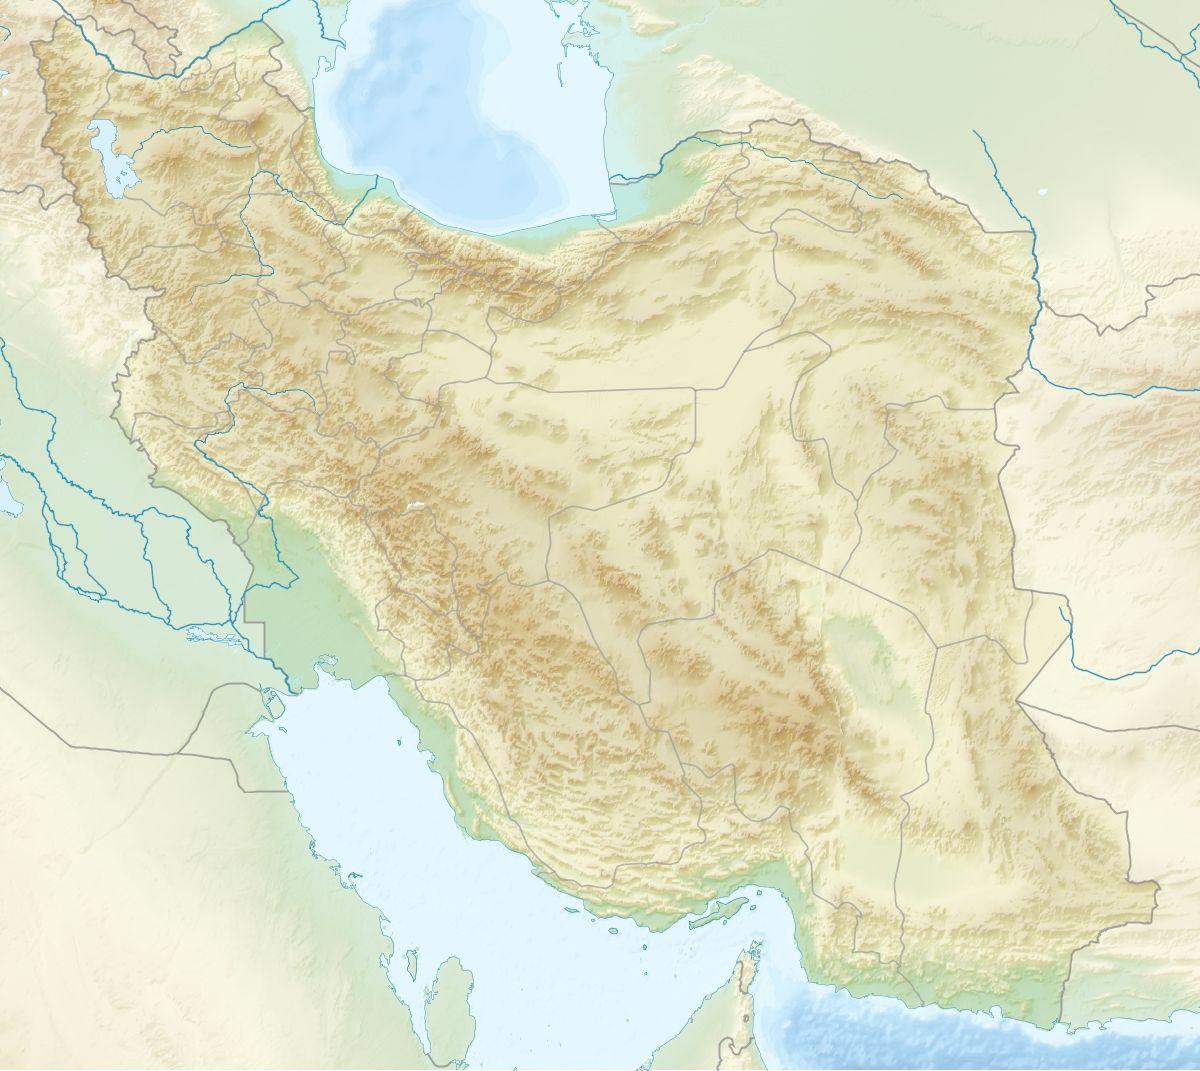 Potresi U Iranu Wikipedia